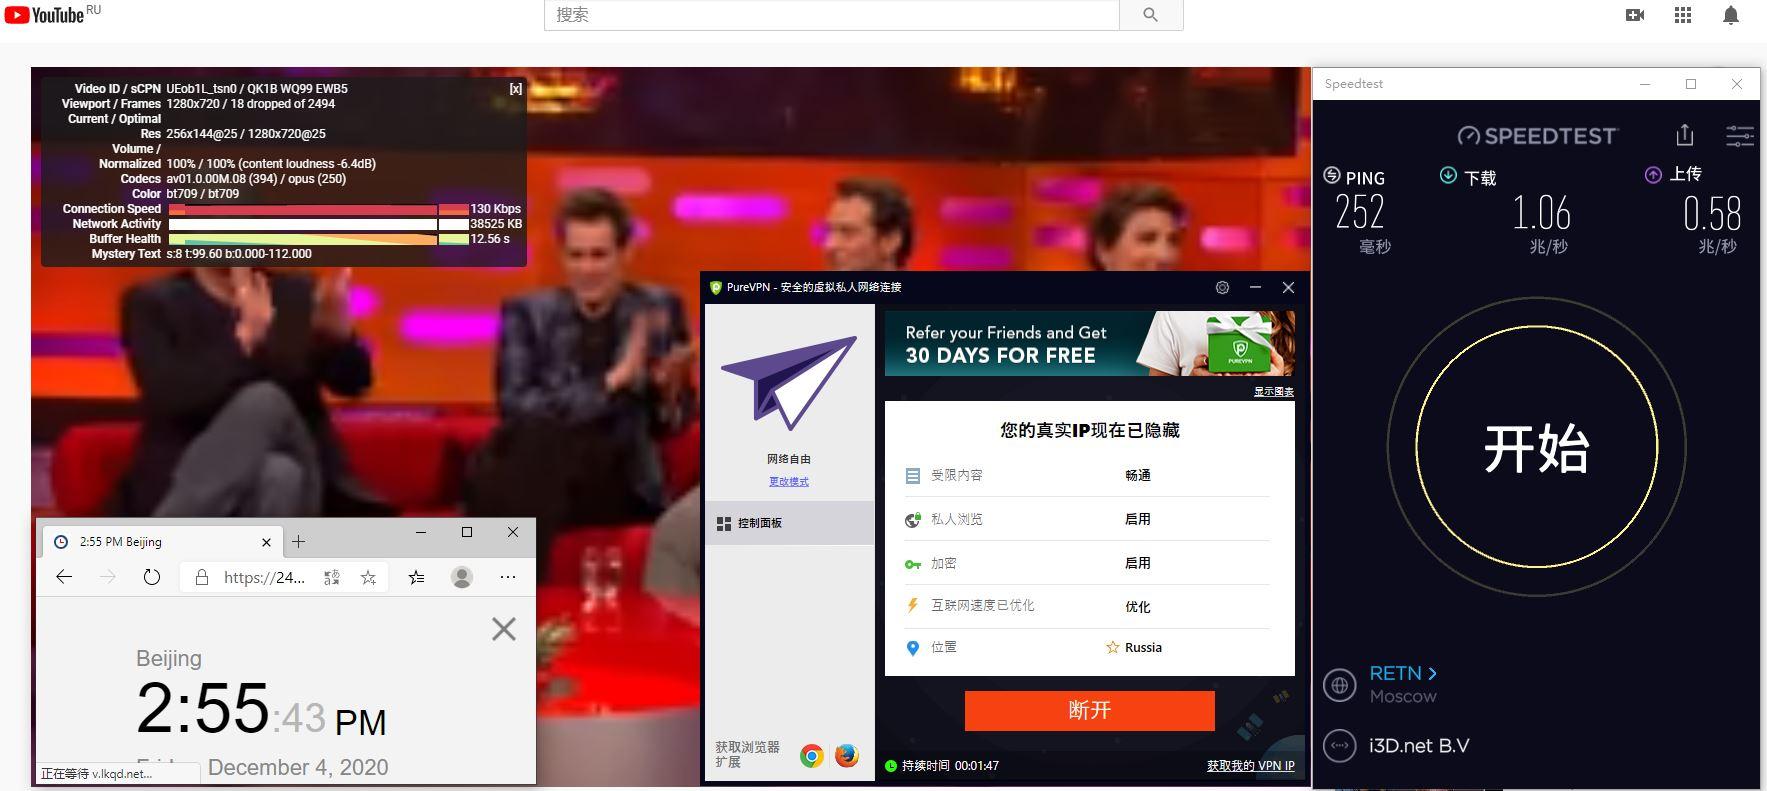 Windows10 PureVPN Russia 服务器 中国VPN 翻墙 科学上网 测试 - 20201204